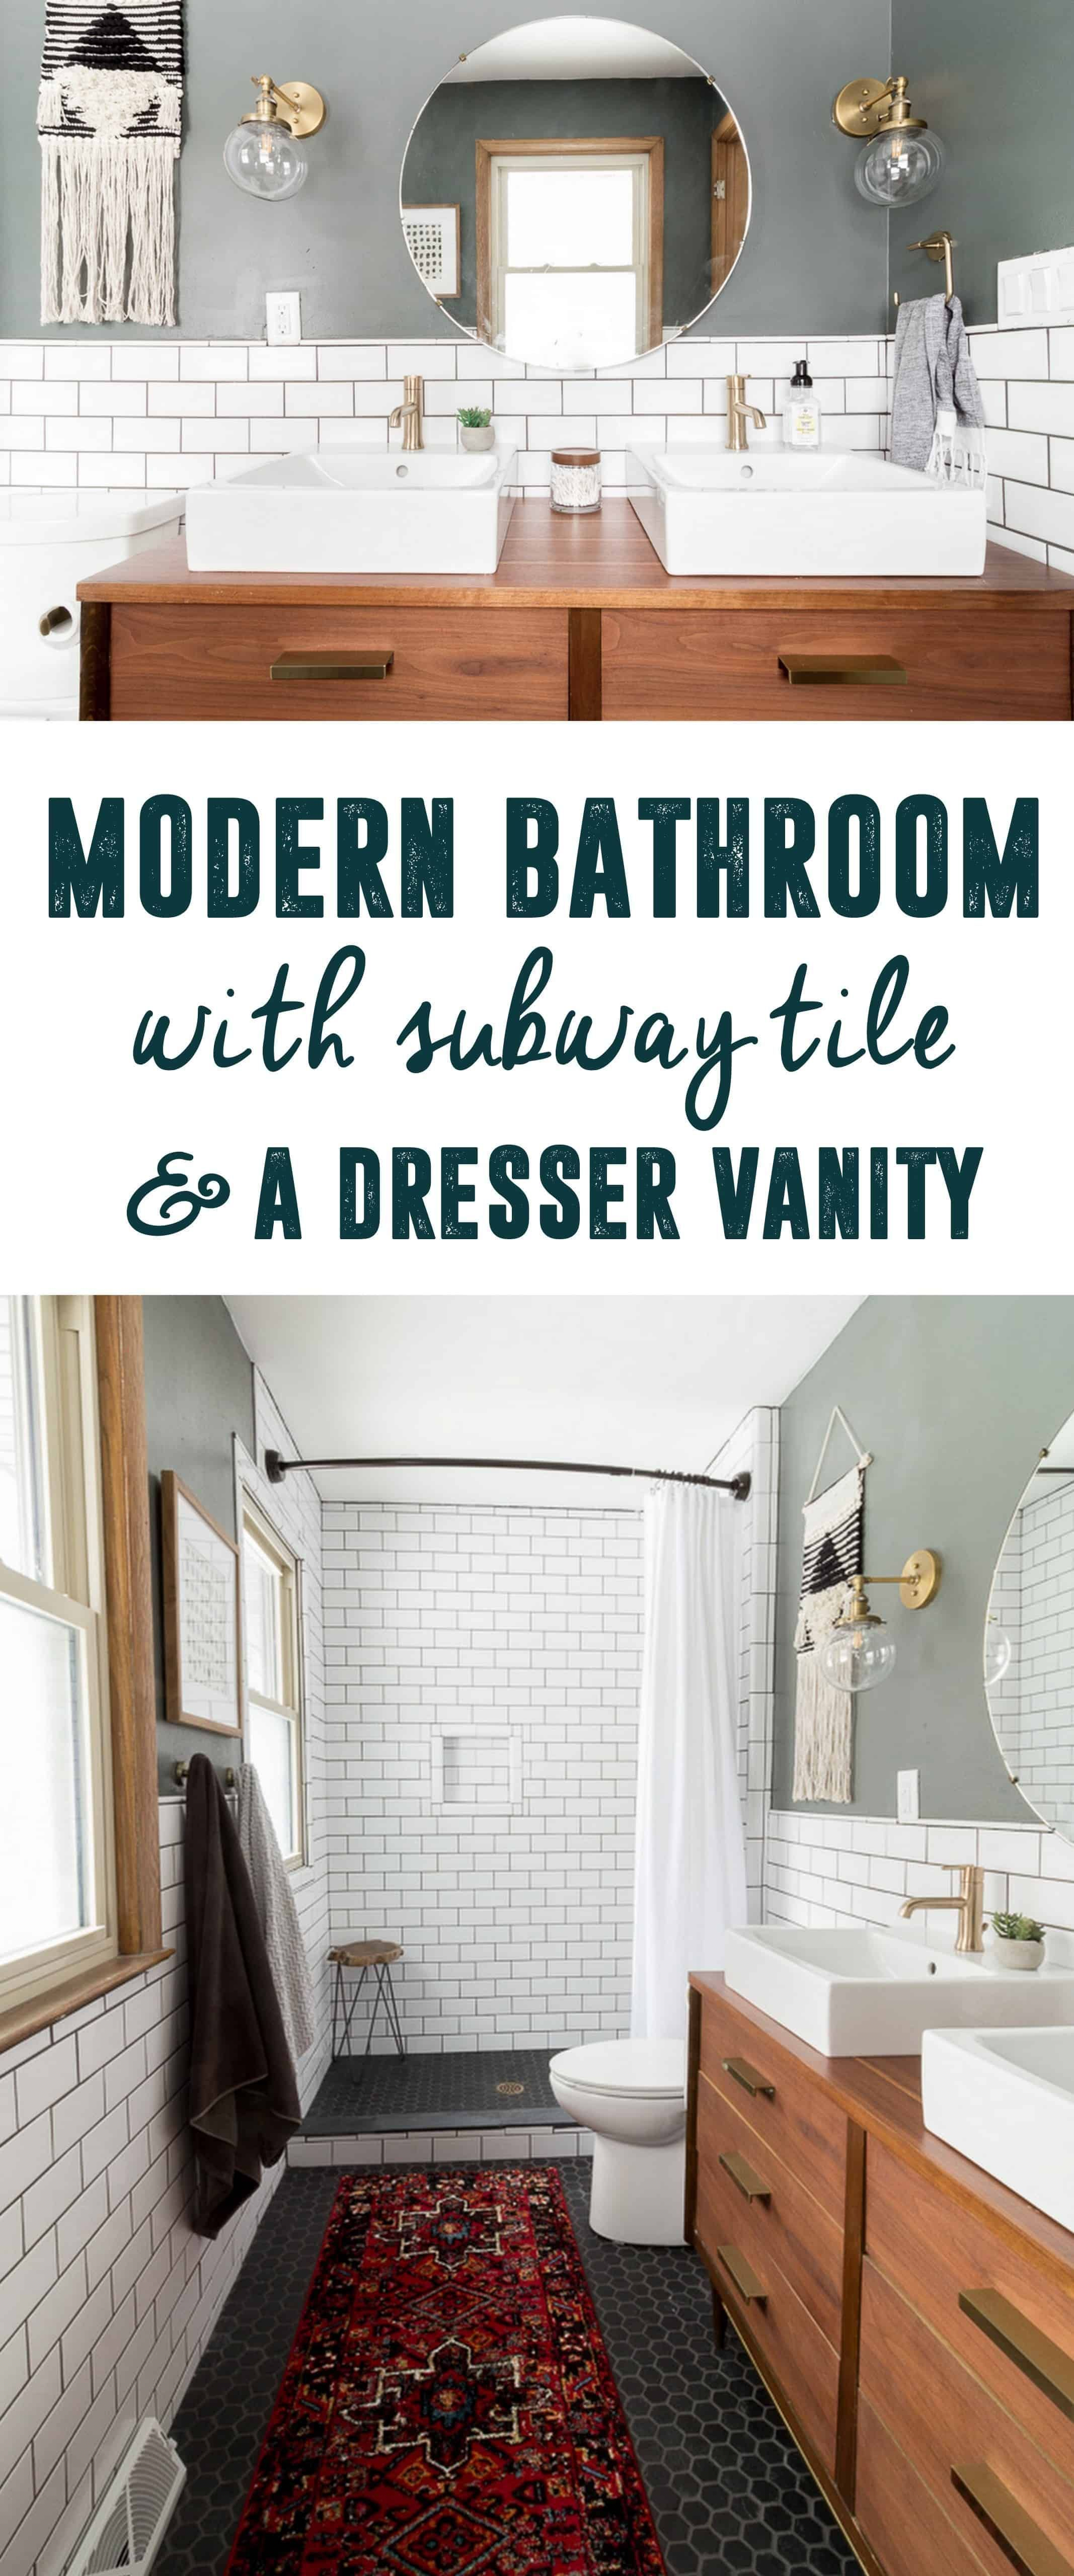 Modern Bathroom with Subway Tile, Bathroom with Dresser as ...